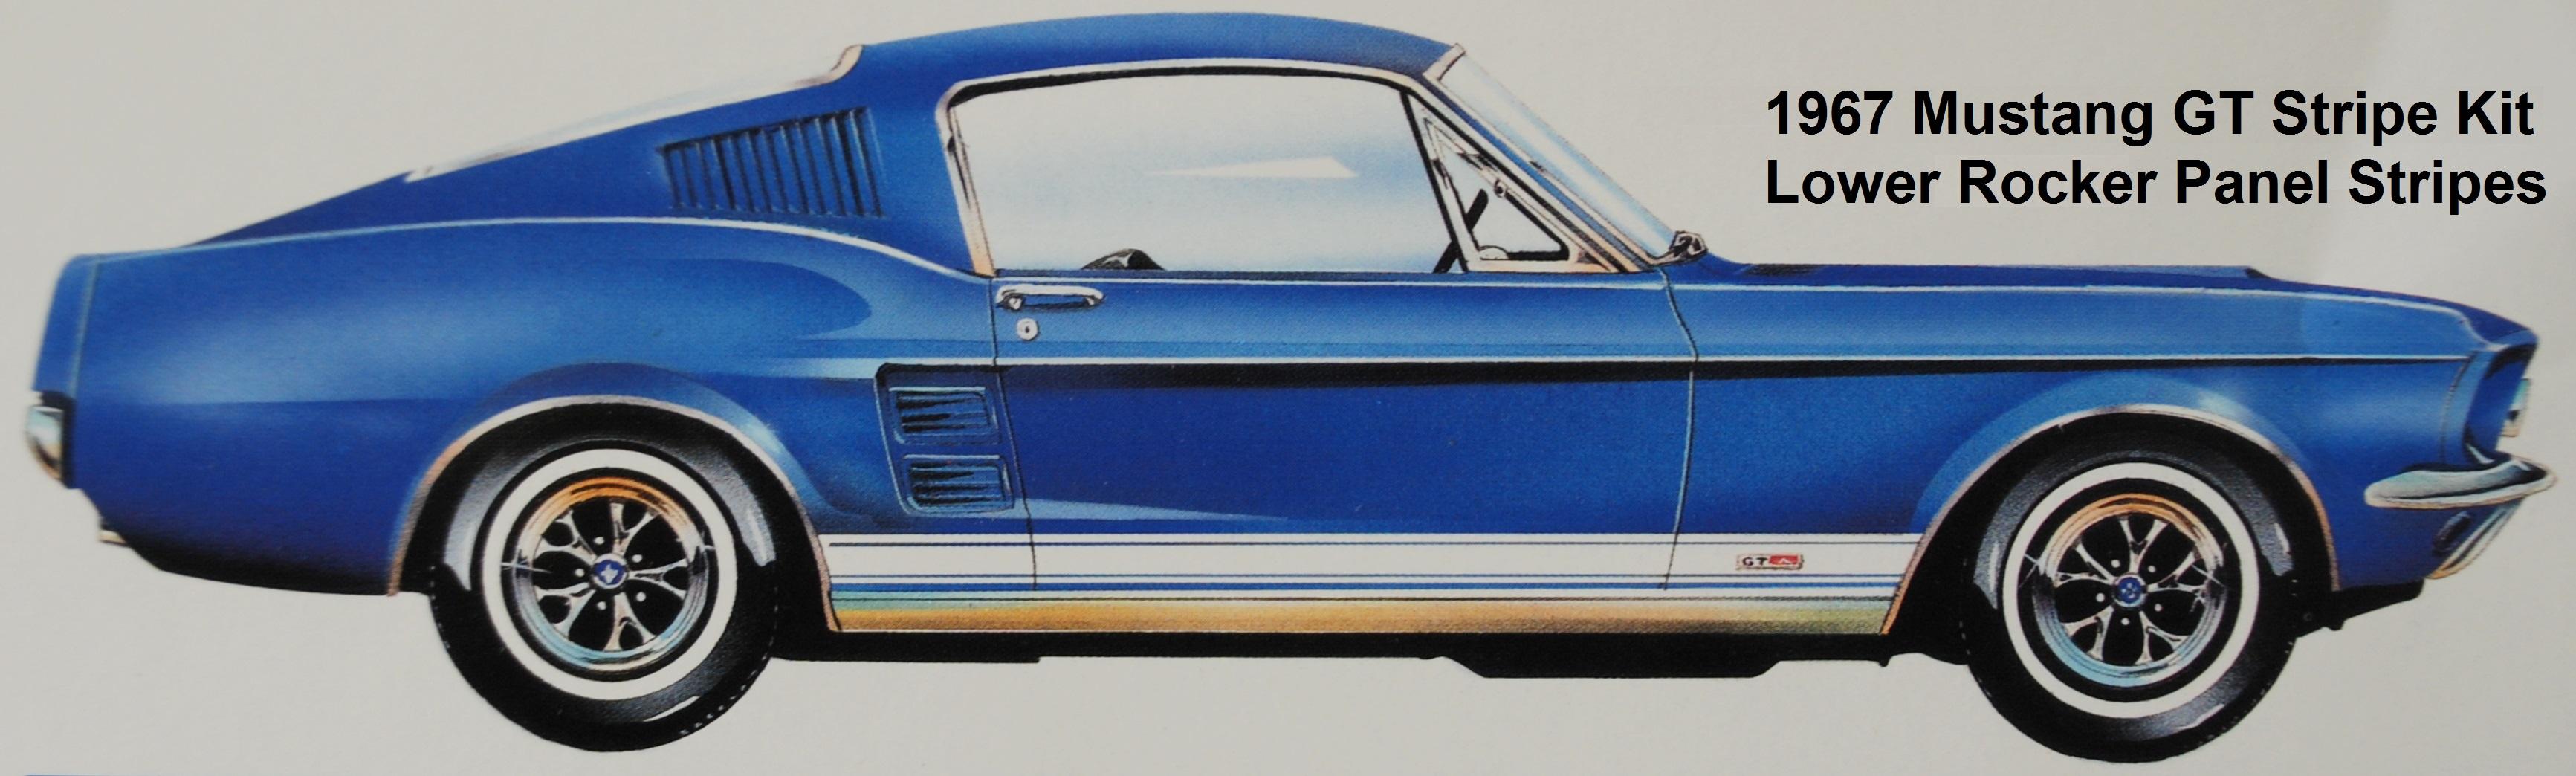 1967 67 Mustang Stripe Kit - Mustang GT Side Stripe